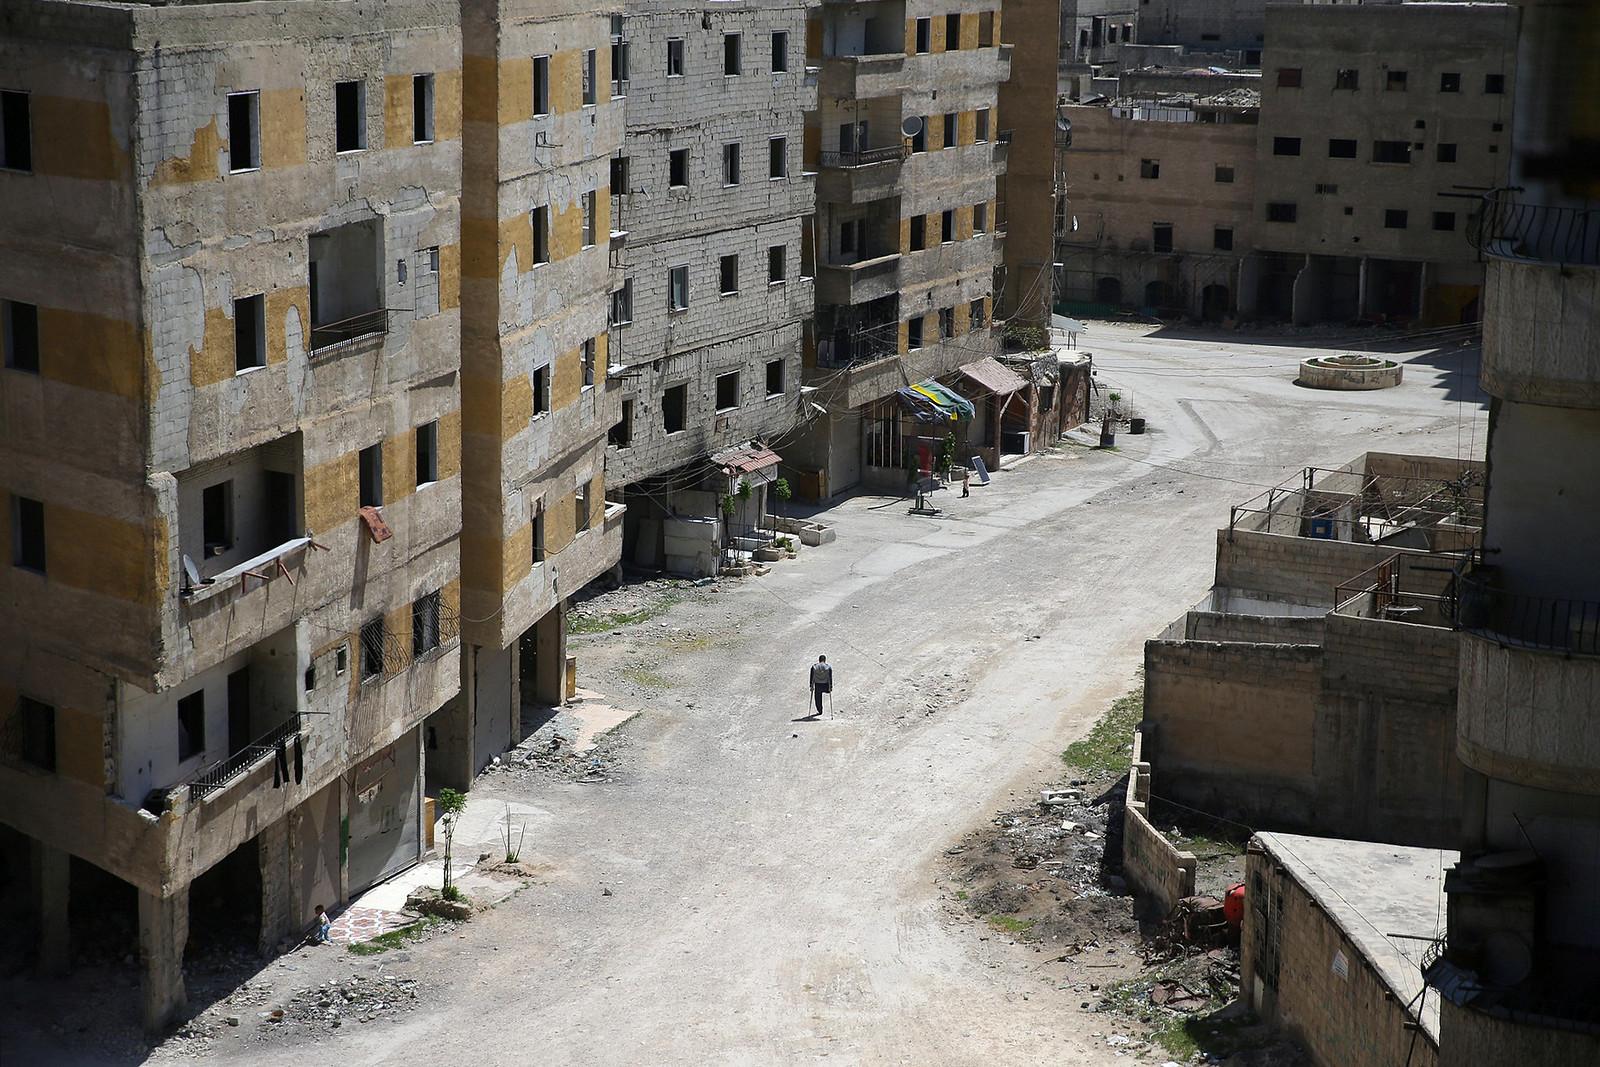 Abu Malek, uses his crutches to walk a street in Ghouta, Syria   by trust.org